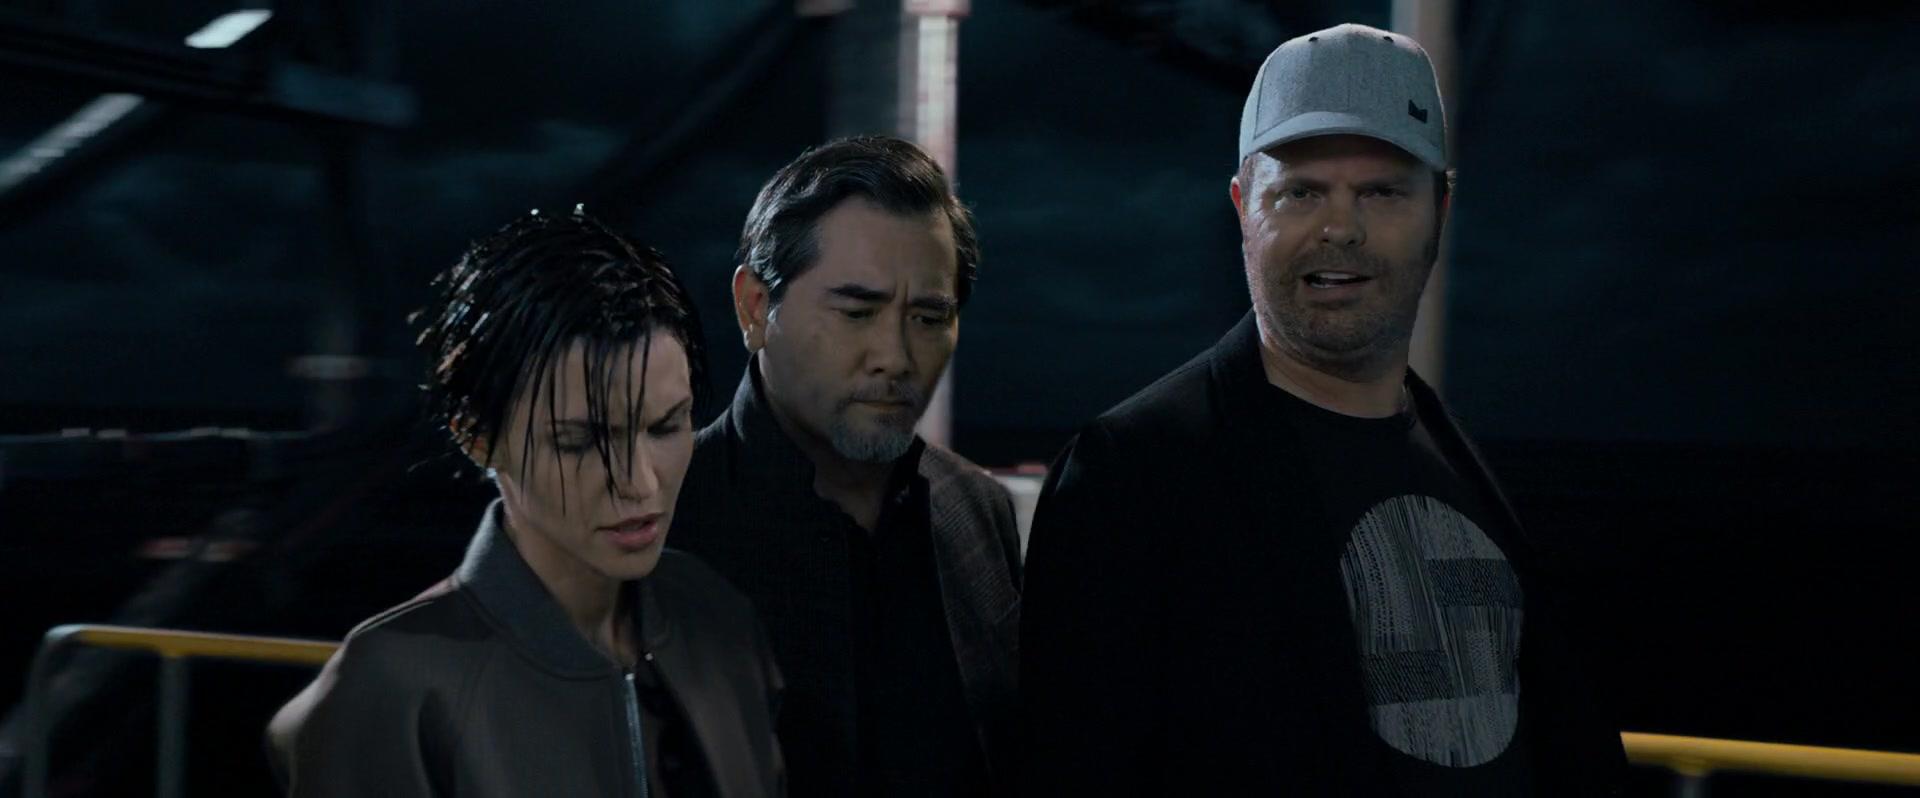 on sale 0c42f 26649 Melin Grey Cap Worn by Rainn Wilson in The Meg (2018) Movie Product  Placement